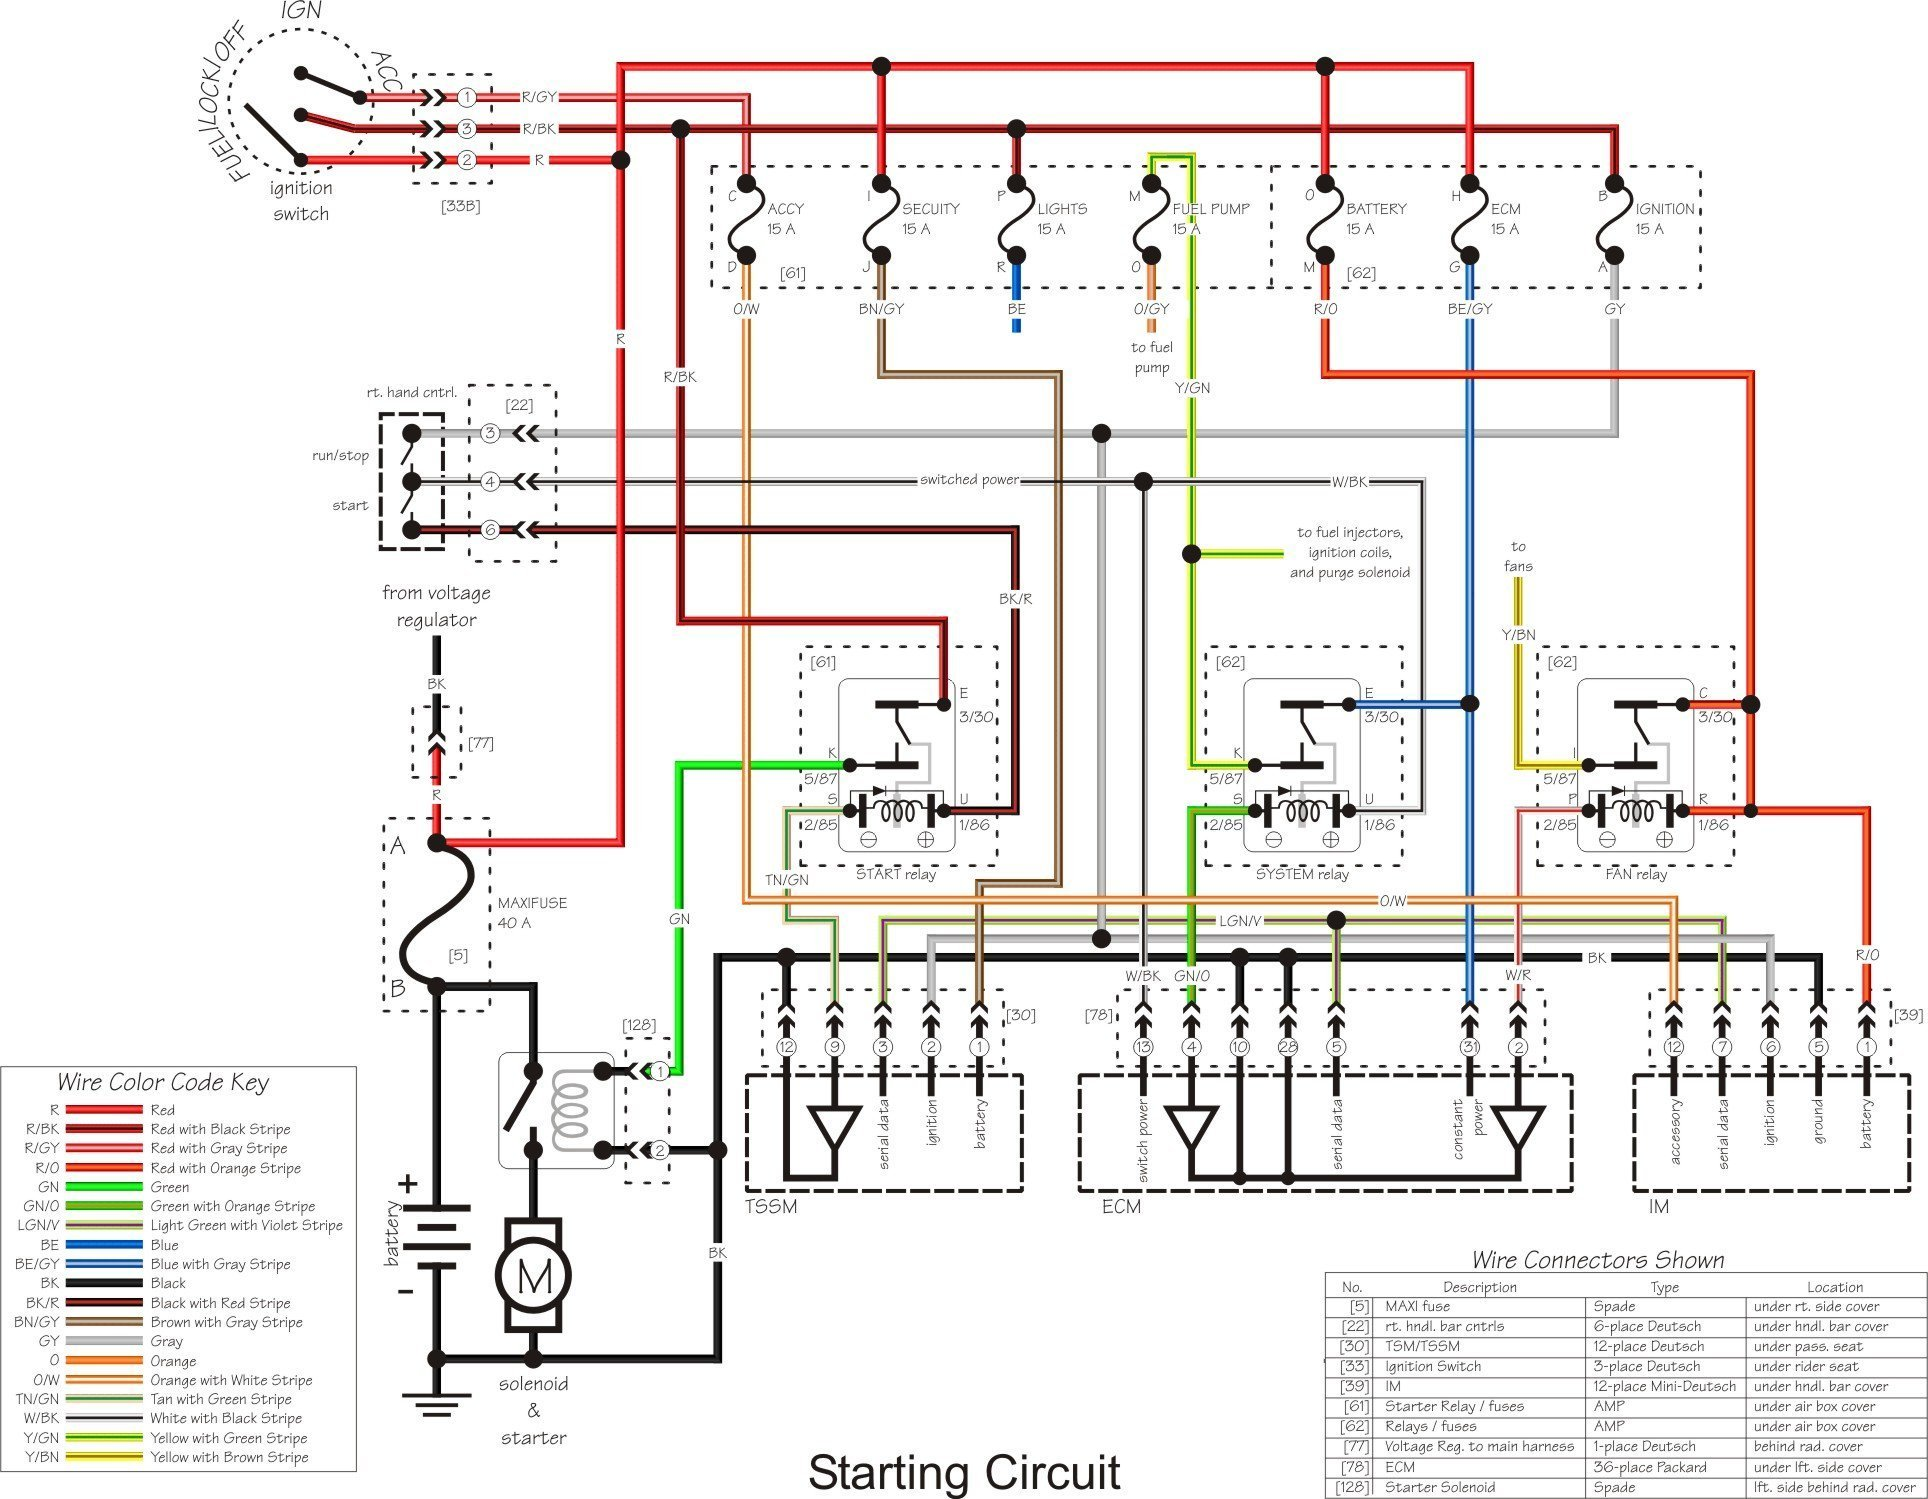 Erfreut Yamaha Banshee Schaltplan Ideen - Elektrische Schaltplan ...